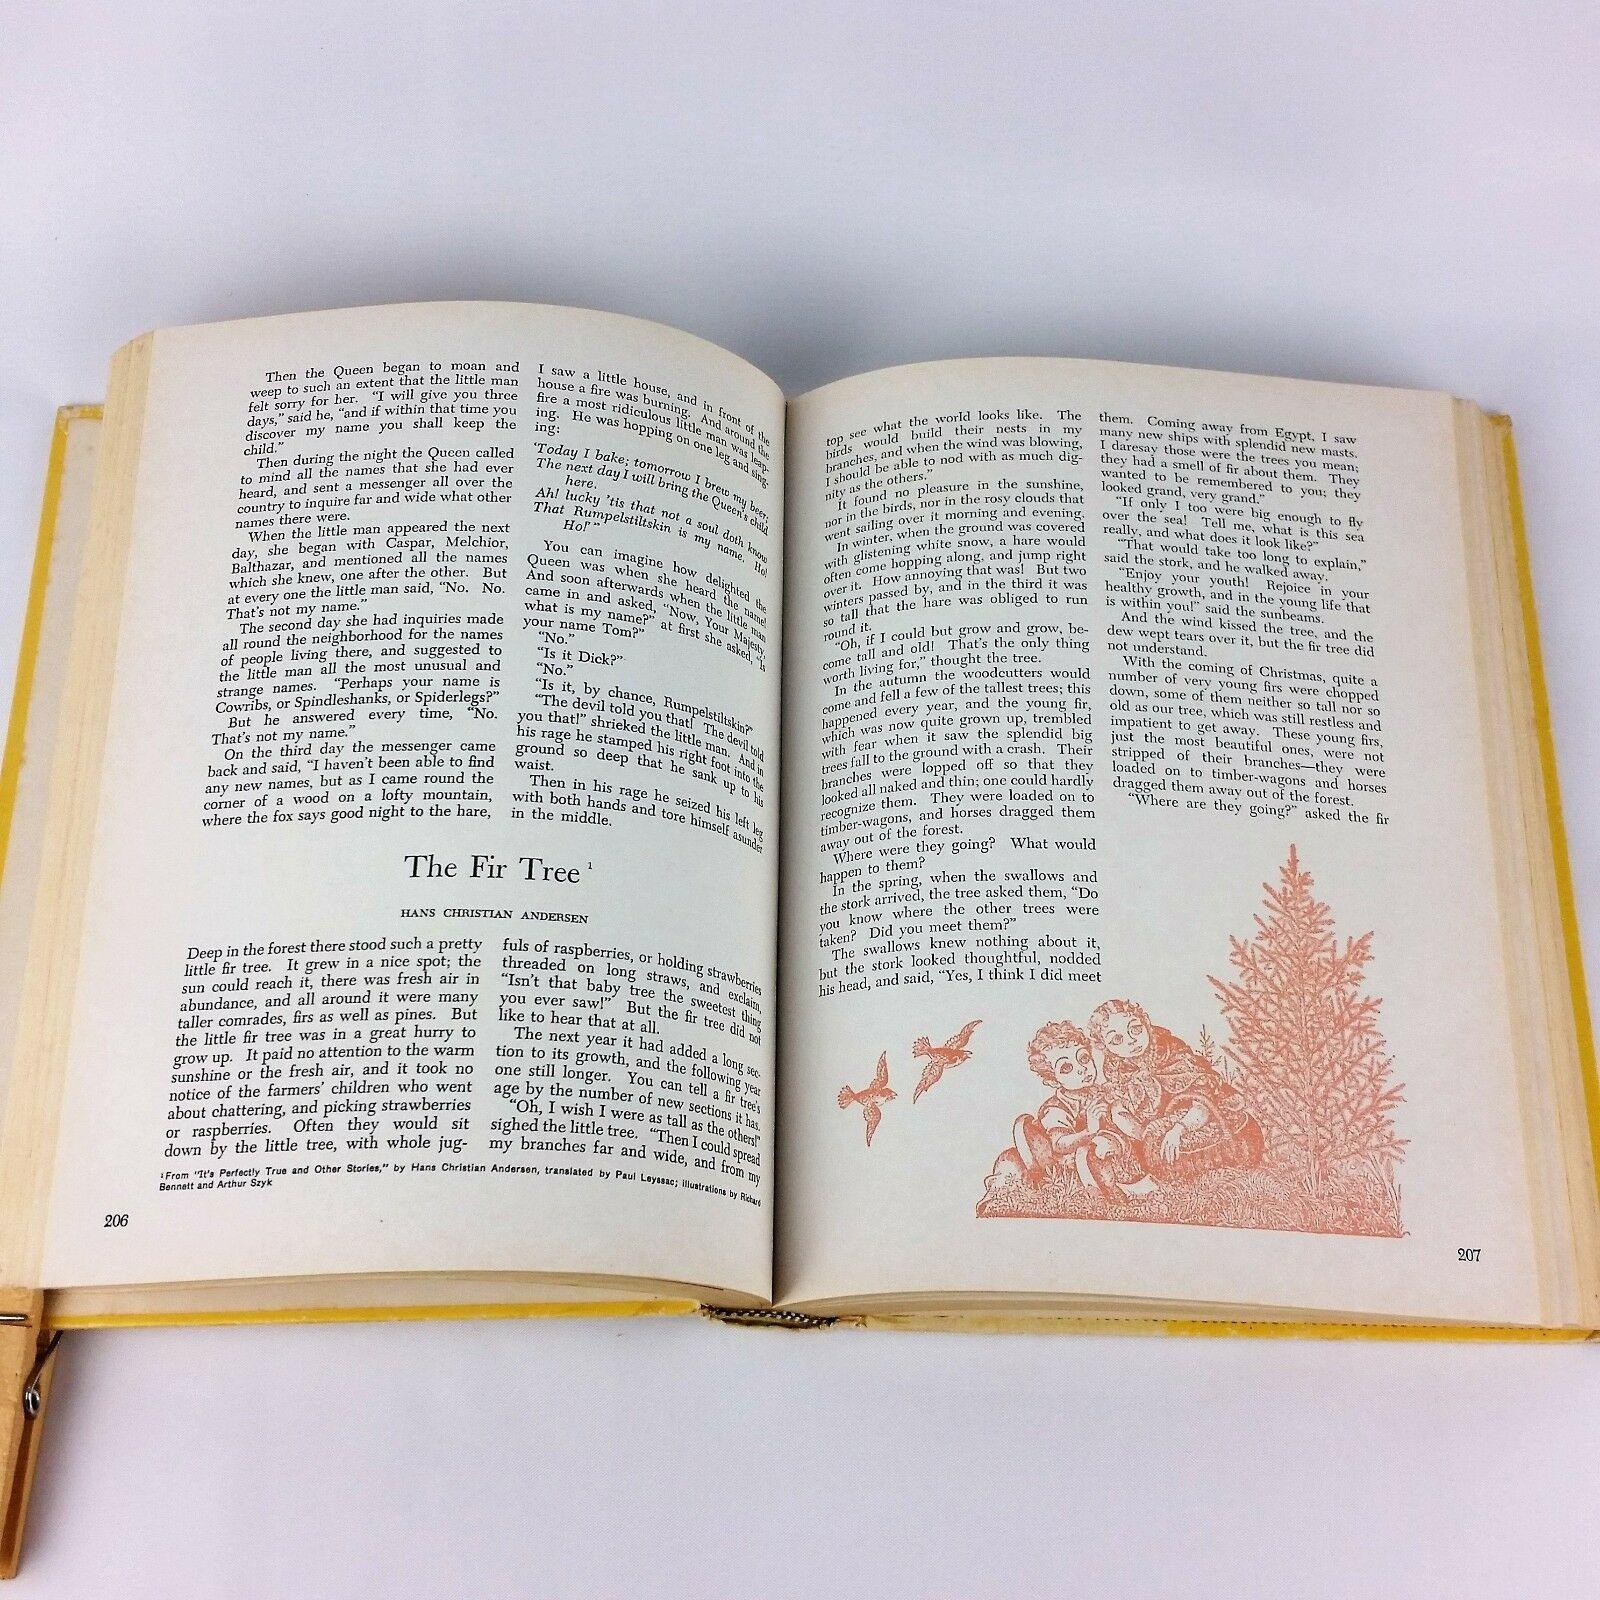 The Illustrated Treasury of Childrens Literature 1955 Vintage Book HC Martignoni